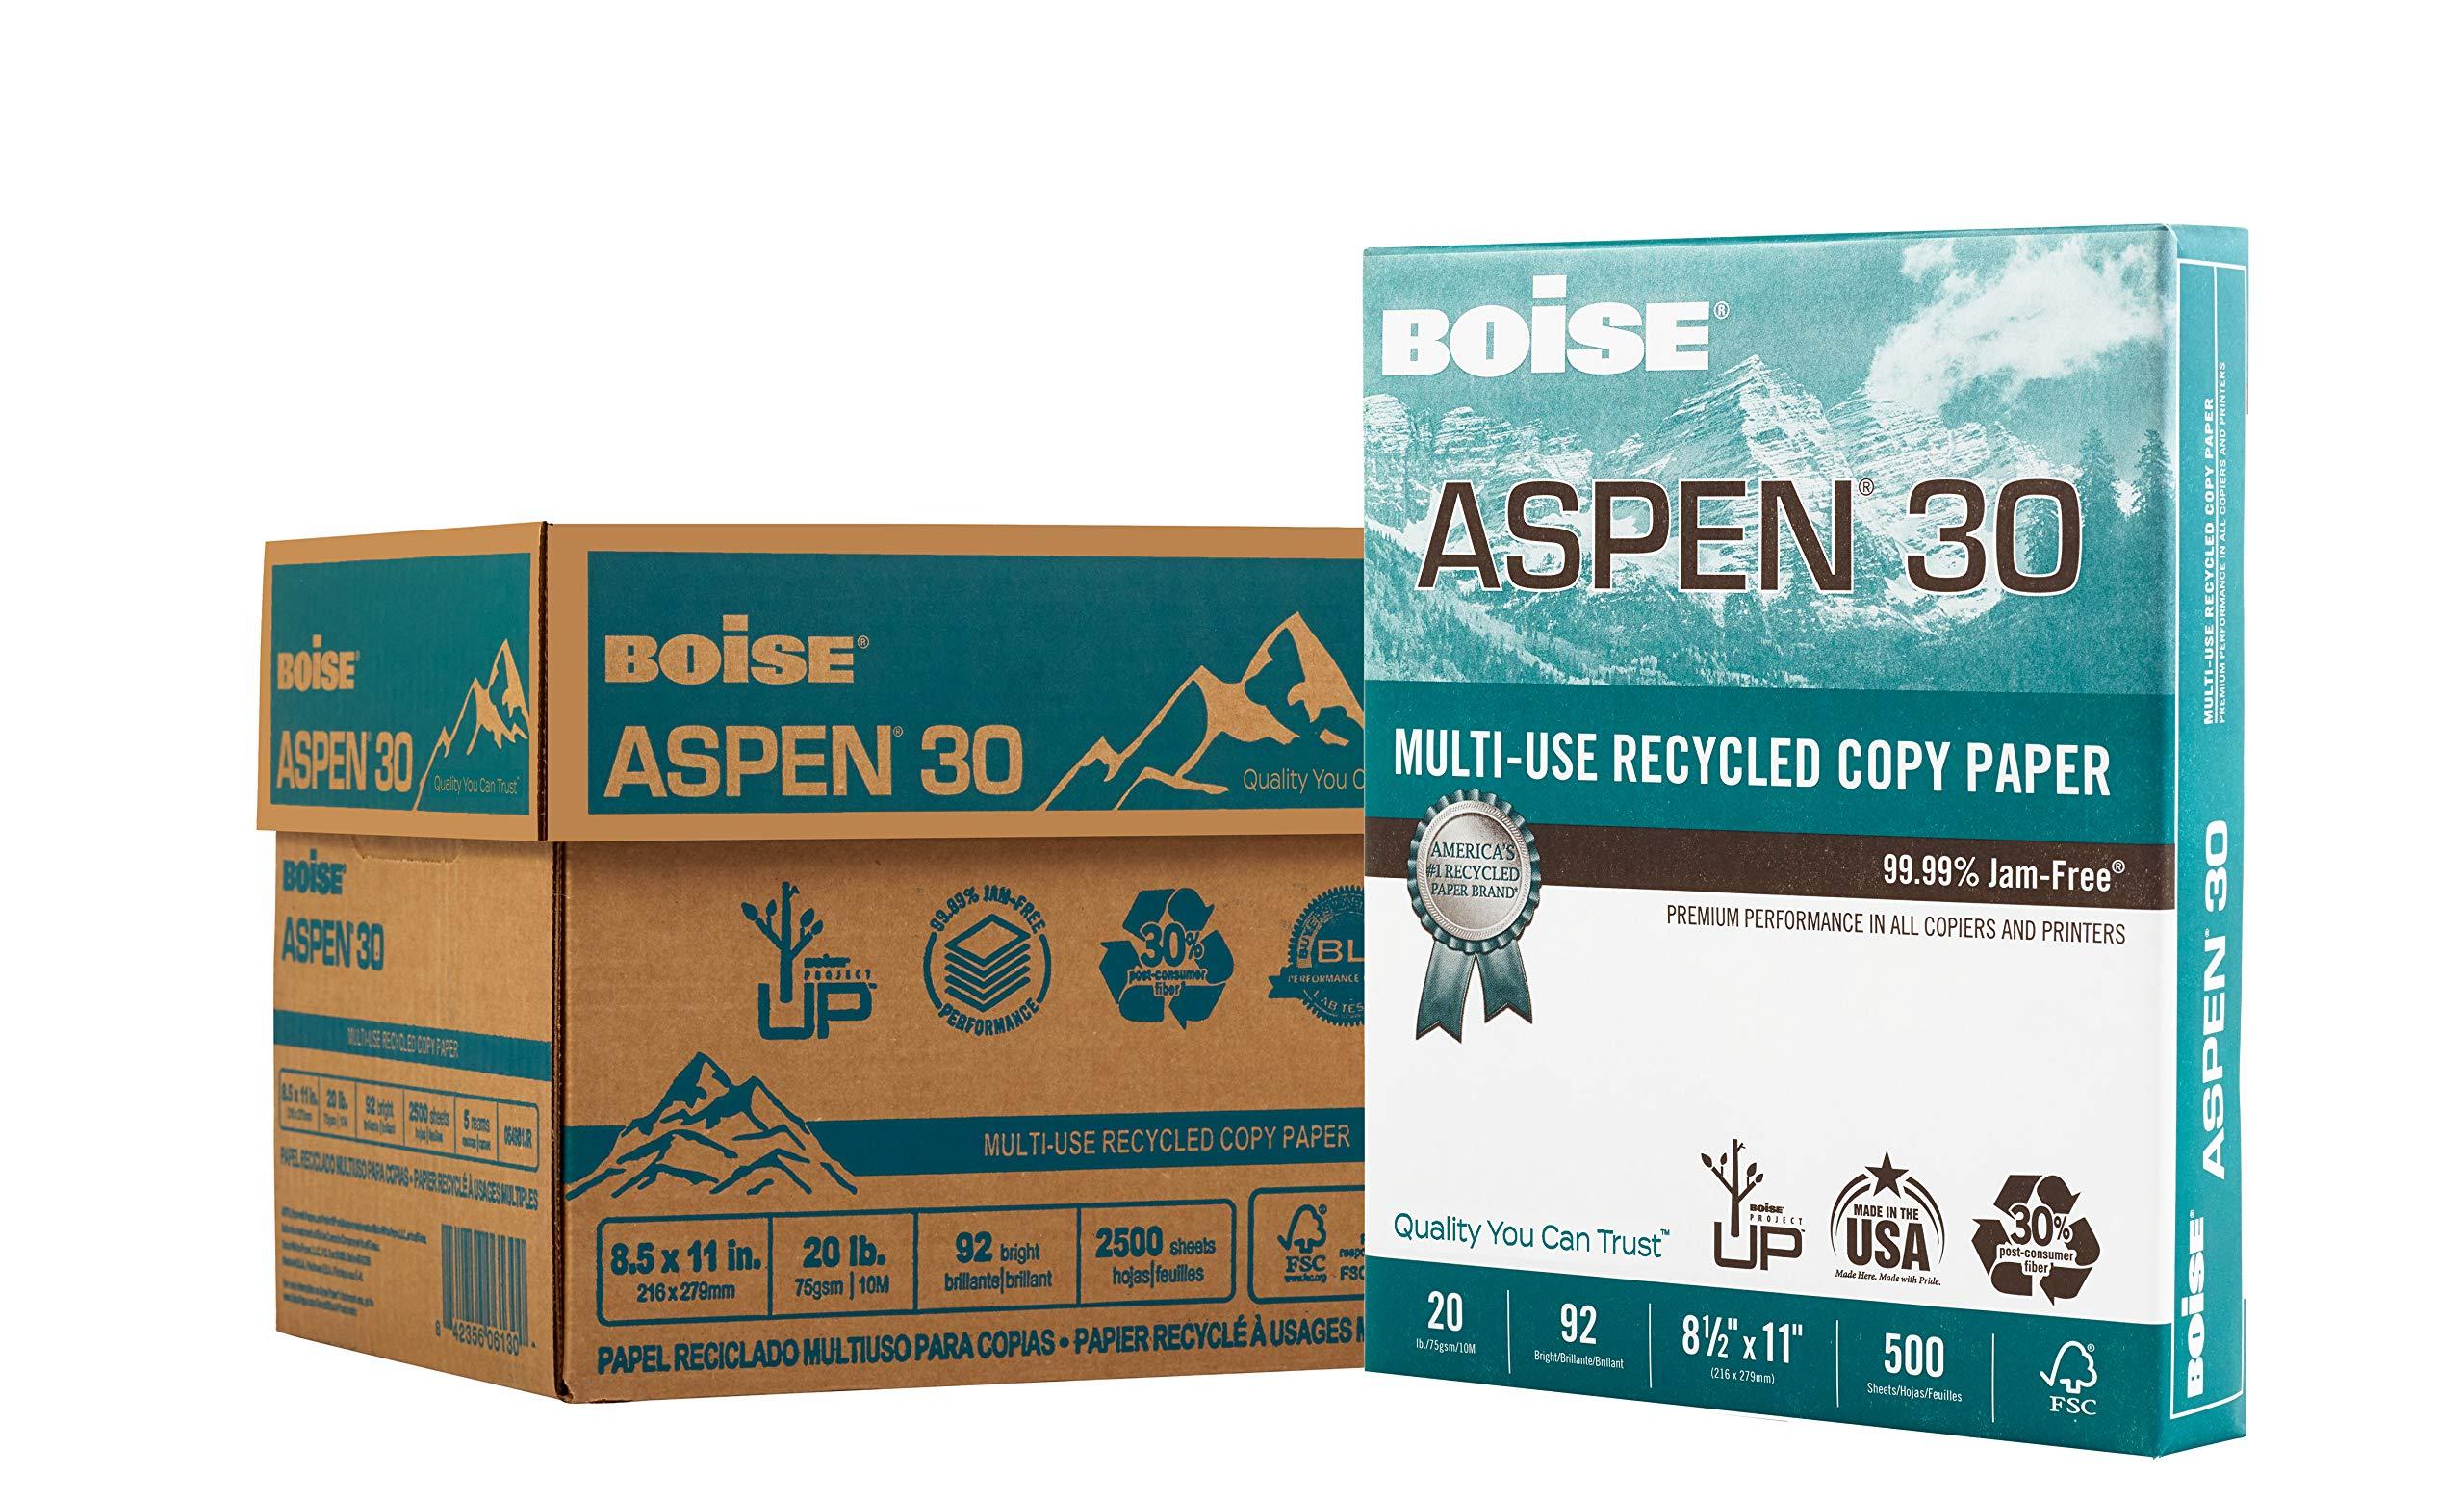 "BOISE ASPEN 30% Recycled Multi-Use Copy Paper, 8.5"" x 11"" Letter, 92 Bright White, 20 lb, 5 Ream Carton (2,500 Sheets)"